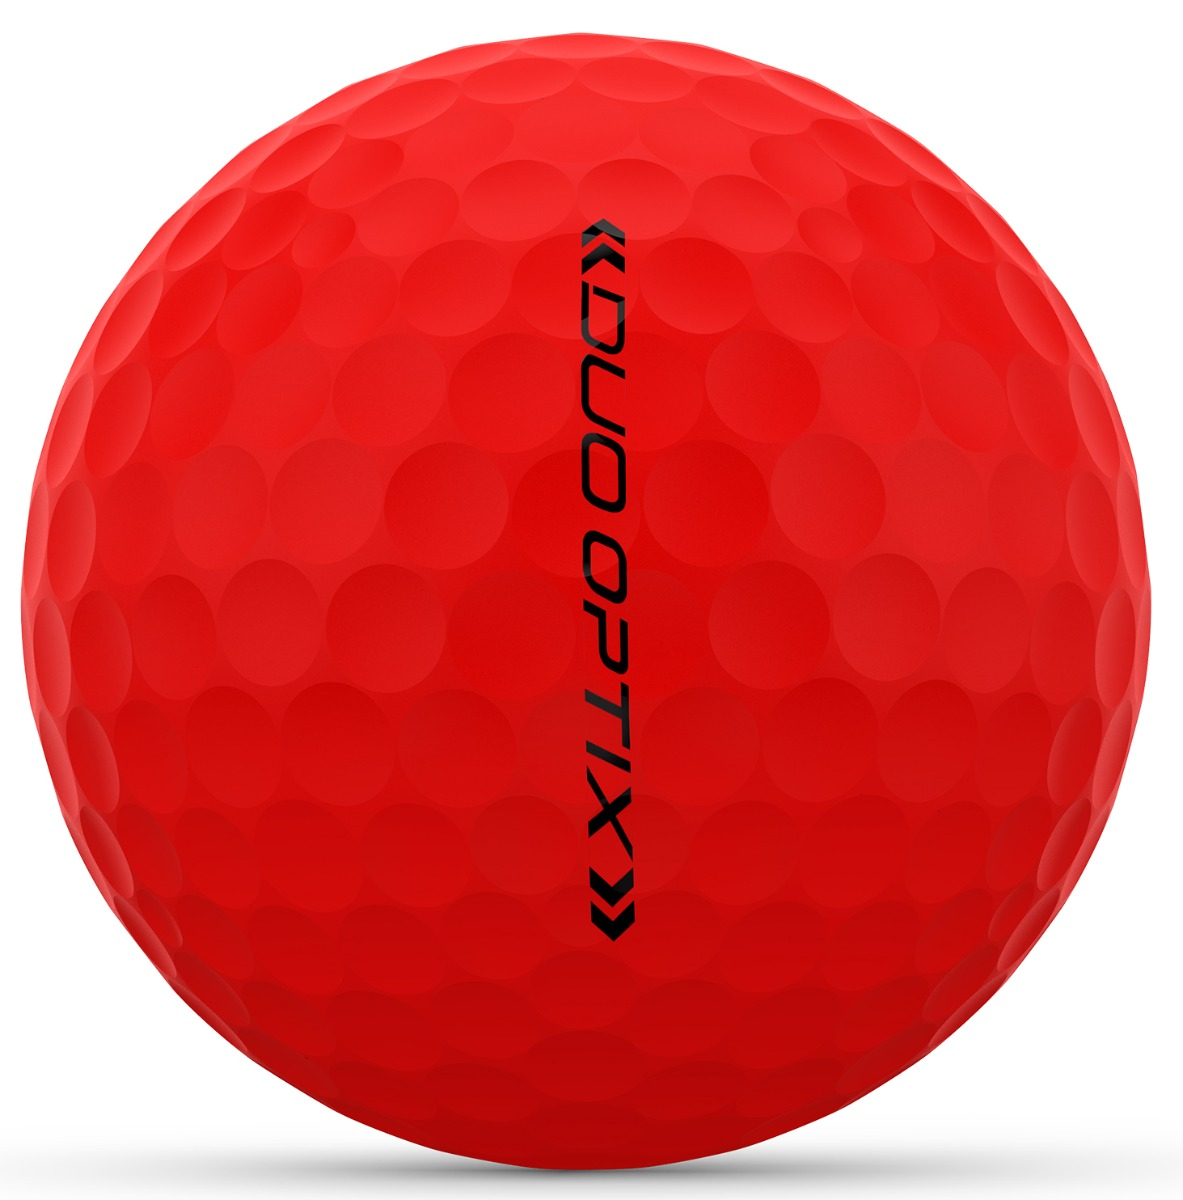 https://www.best4balls.com/pub/media/catalog/product/d/u/duo_optix_red_ball_ball.jpg